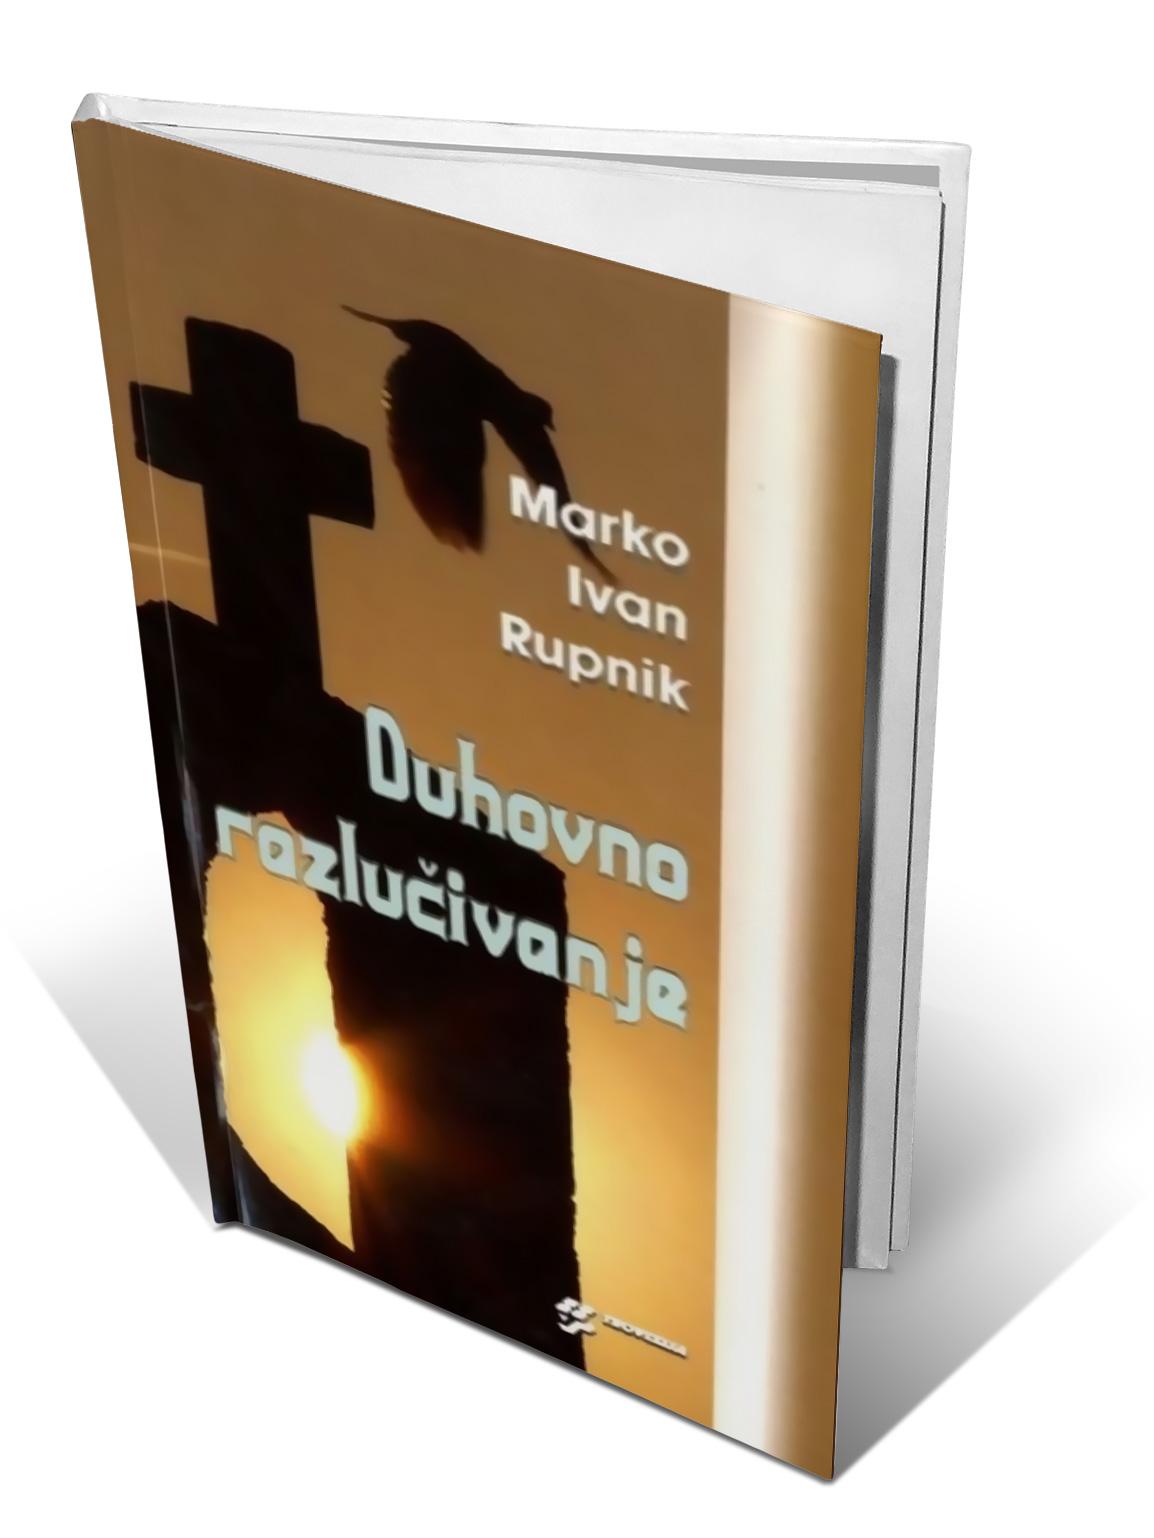 DUHOVNO RAZLUČIVANJE - Marko Ivan Rupnik